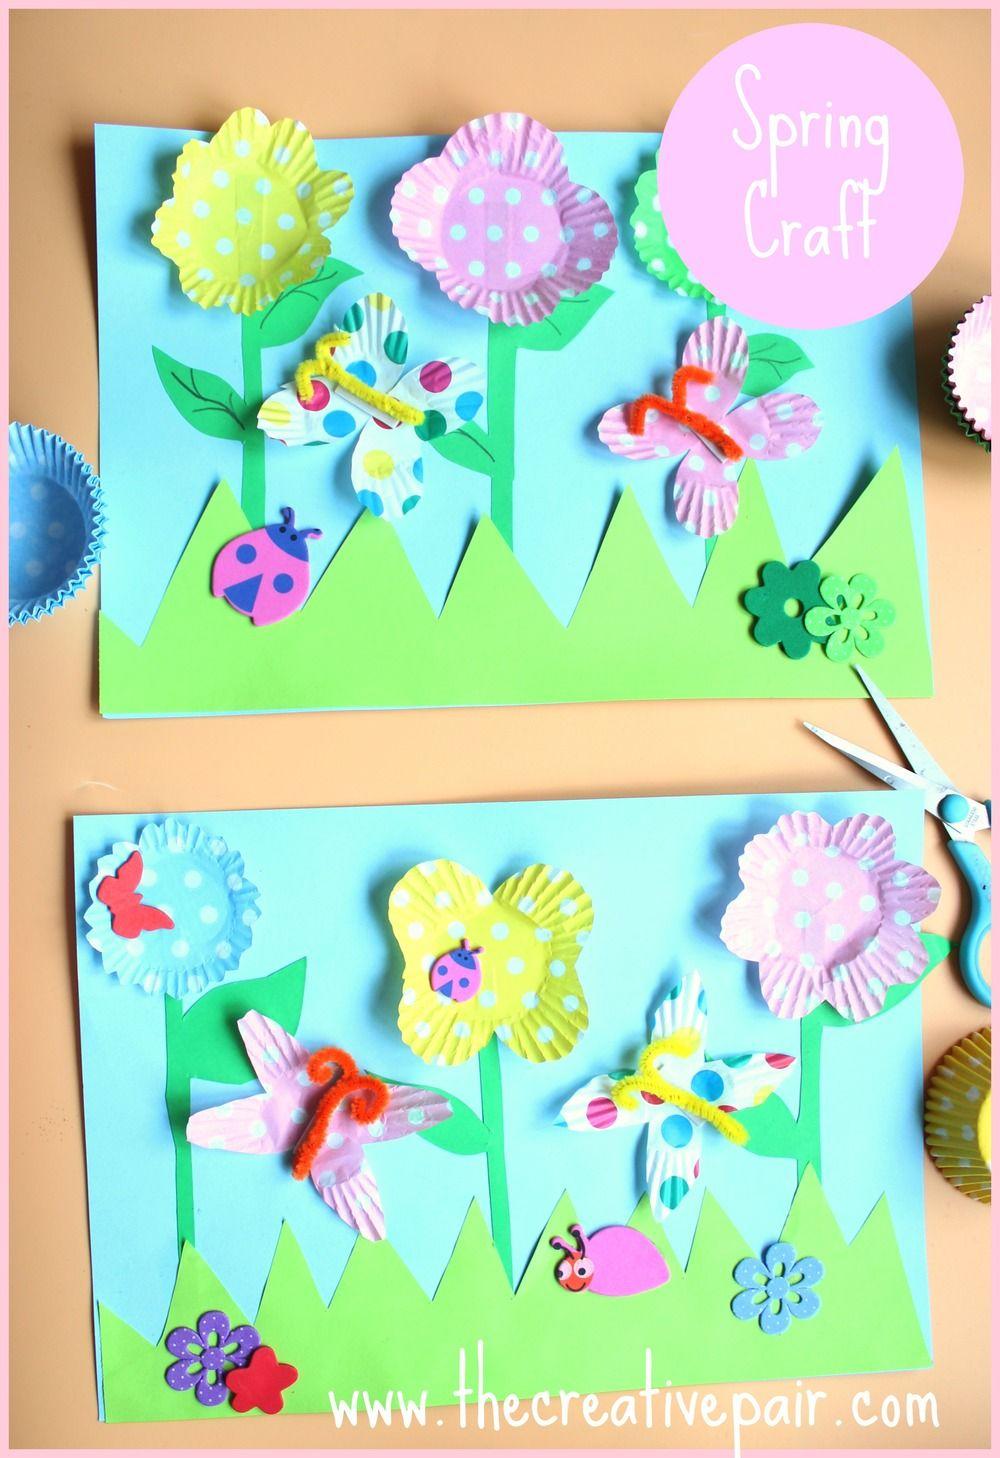 Easter paper craft ideas - Spring Crafts For Kids